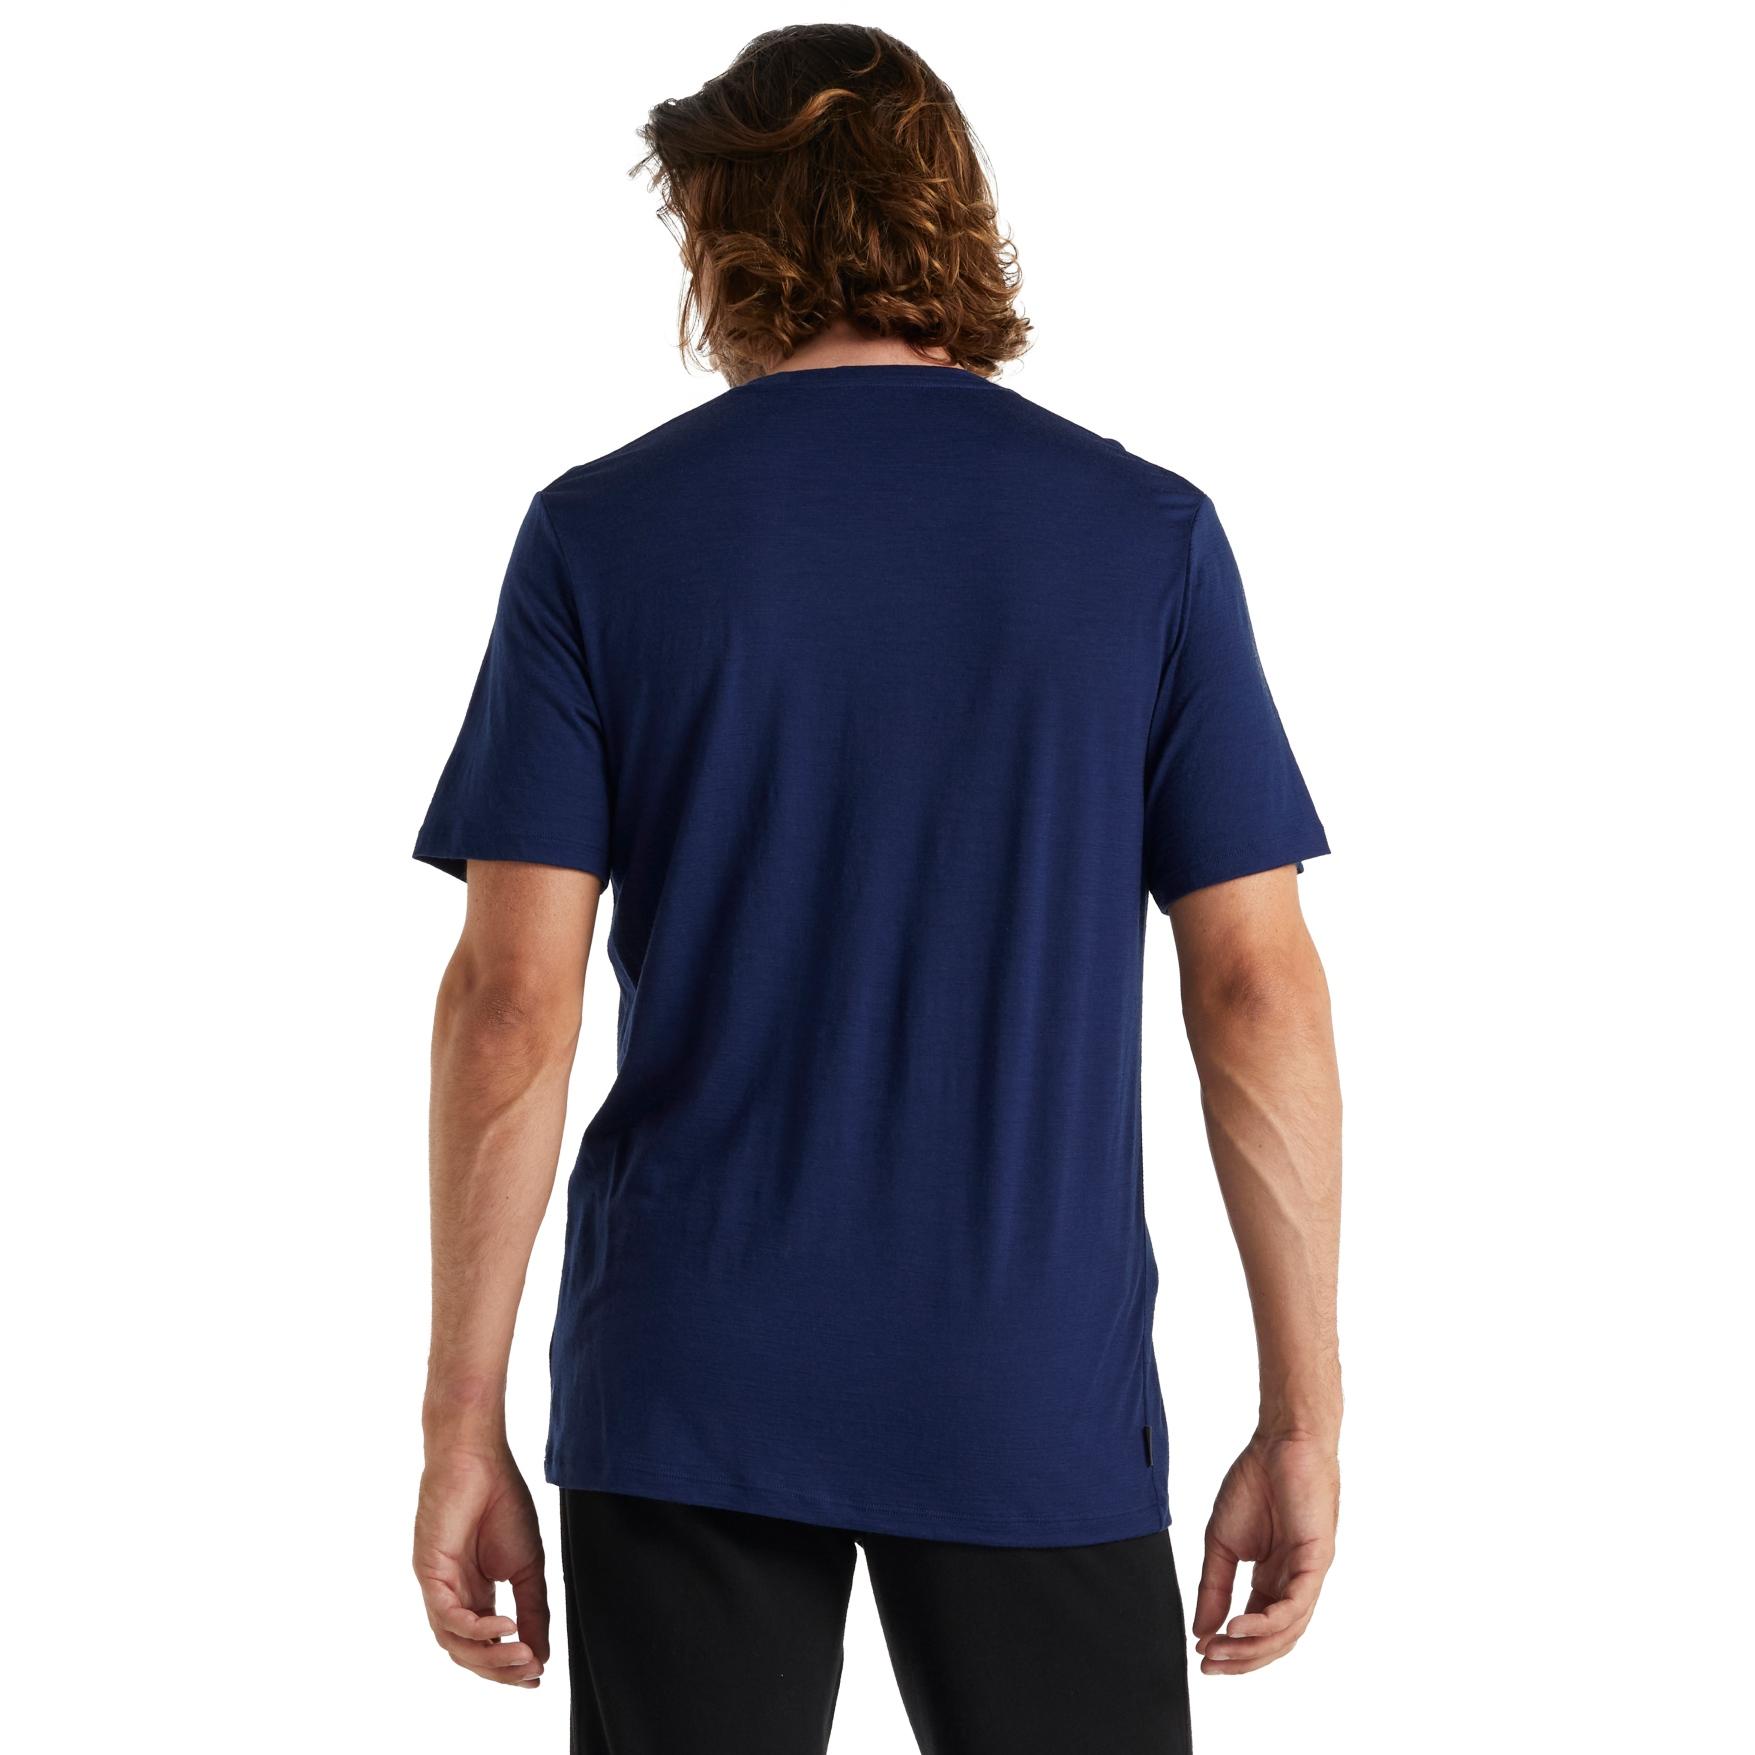 Bild von Icebreaker Tech Lite II Move to Natural Mountain Herren T-Shirt - Royal Navy